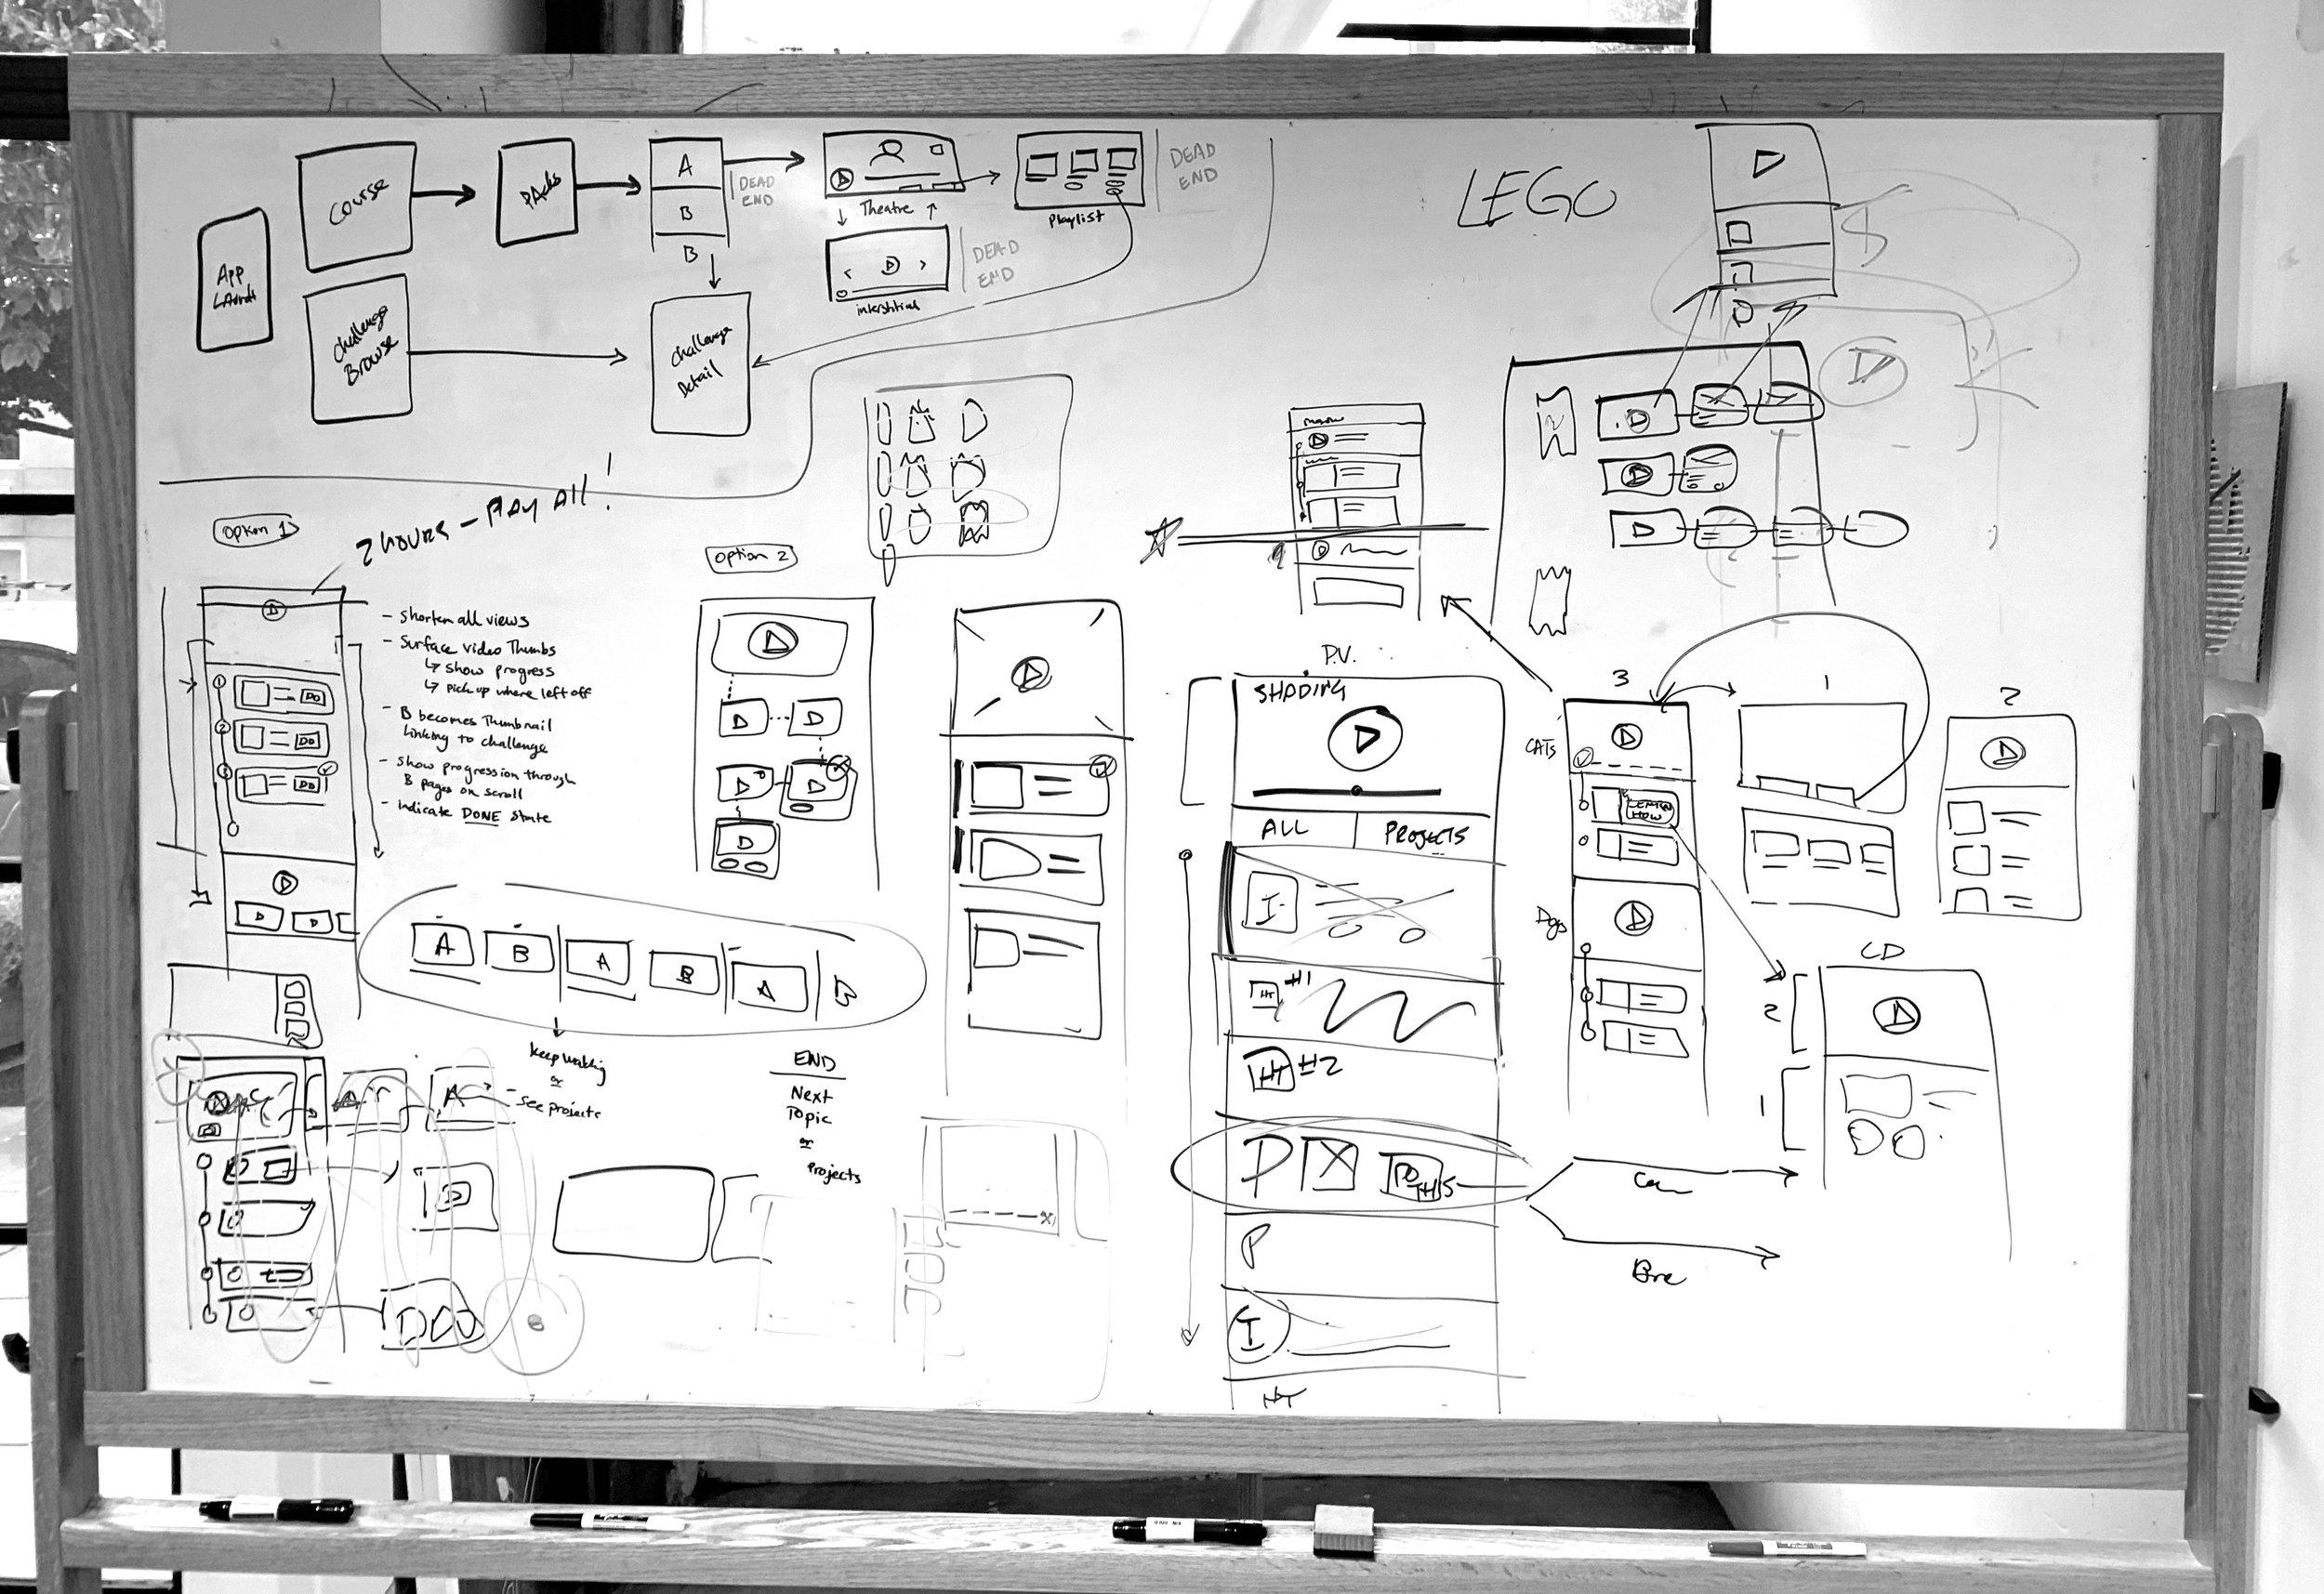 Whiteboard Brainstorm